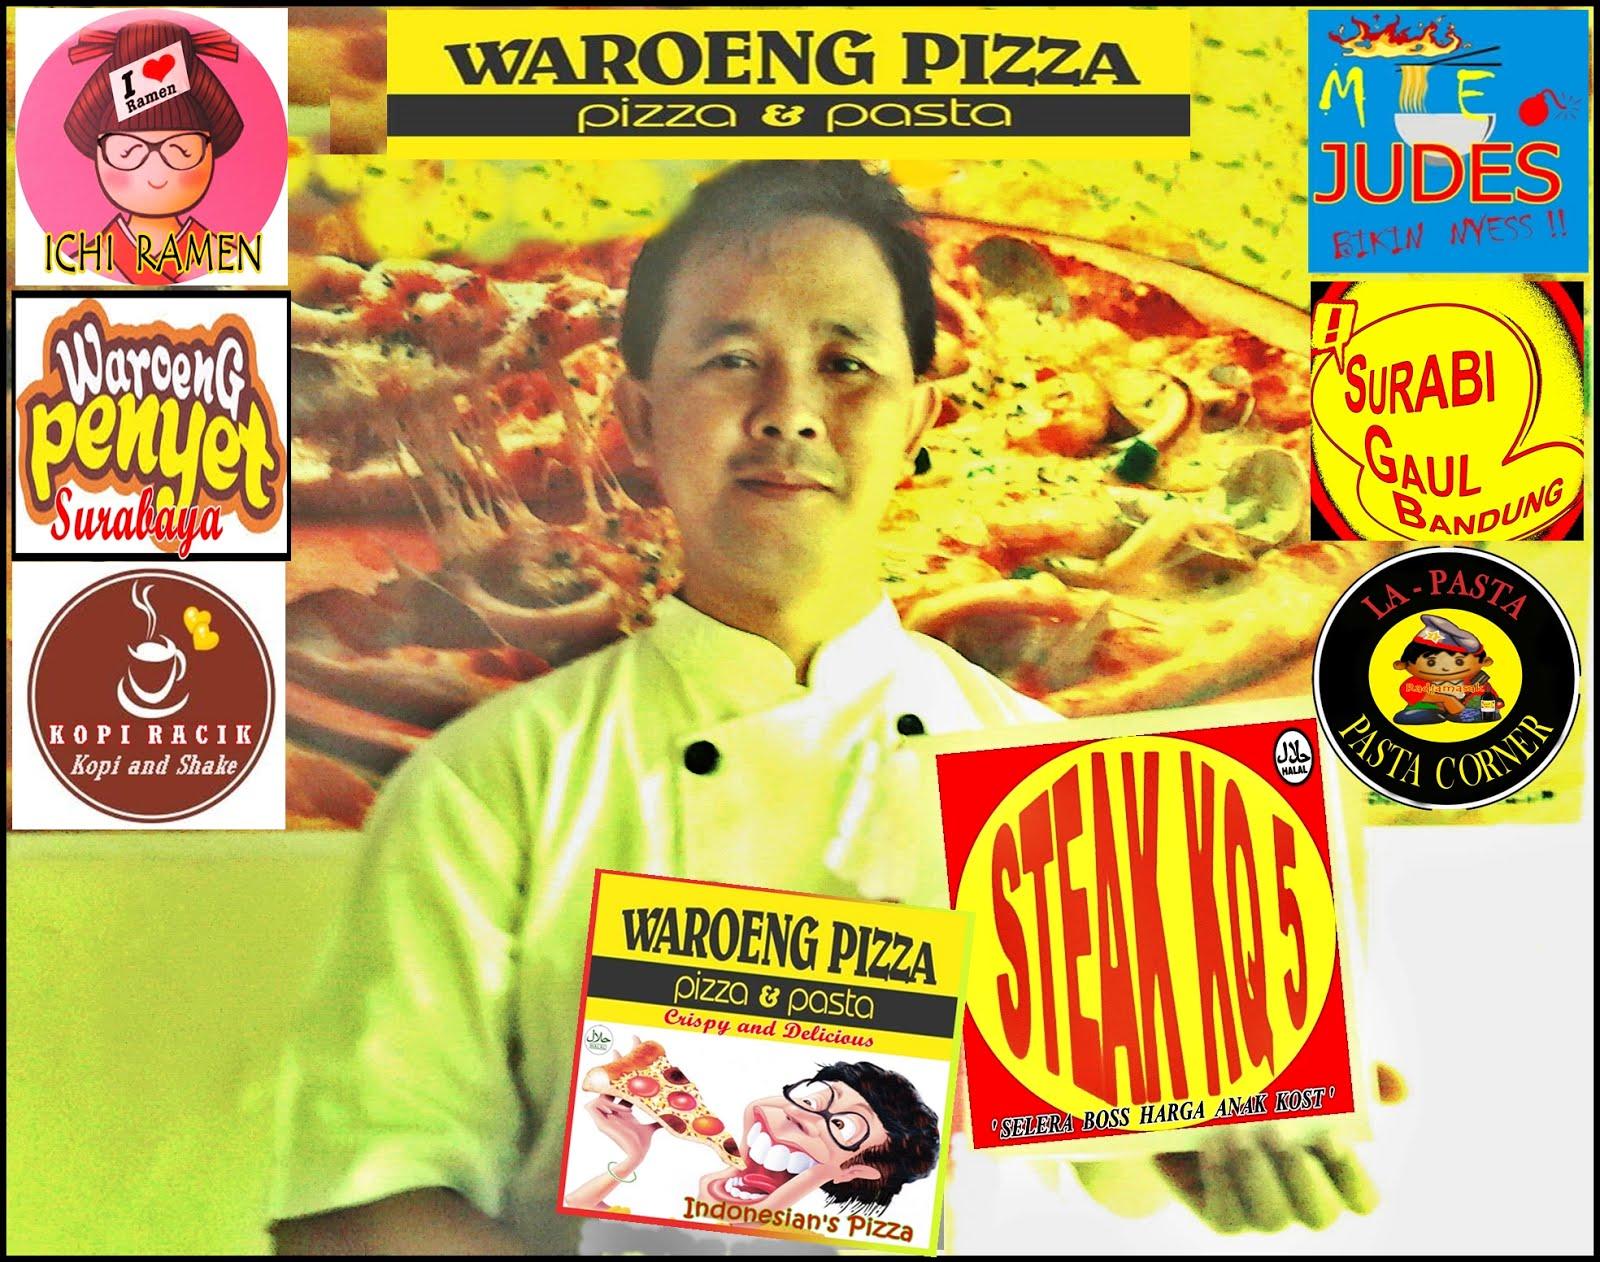 HANDOYO - WAROENG PIZZA